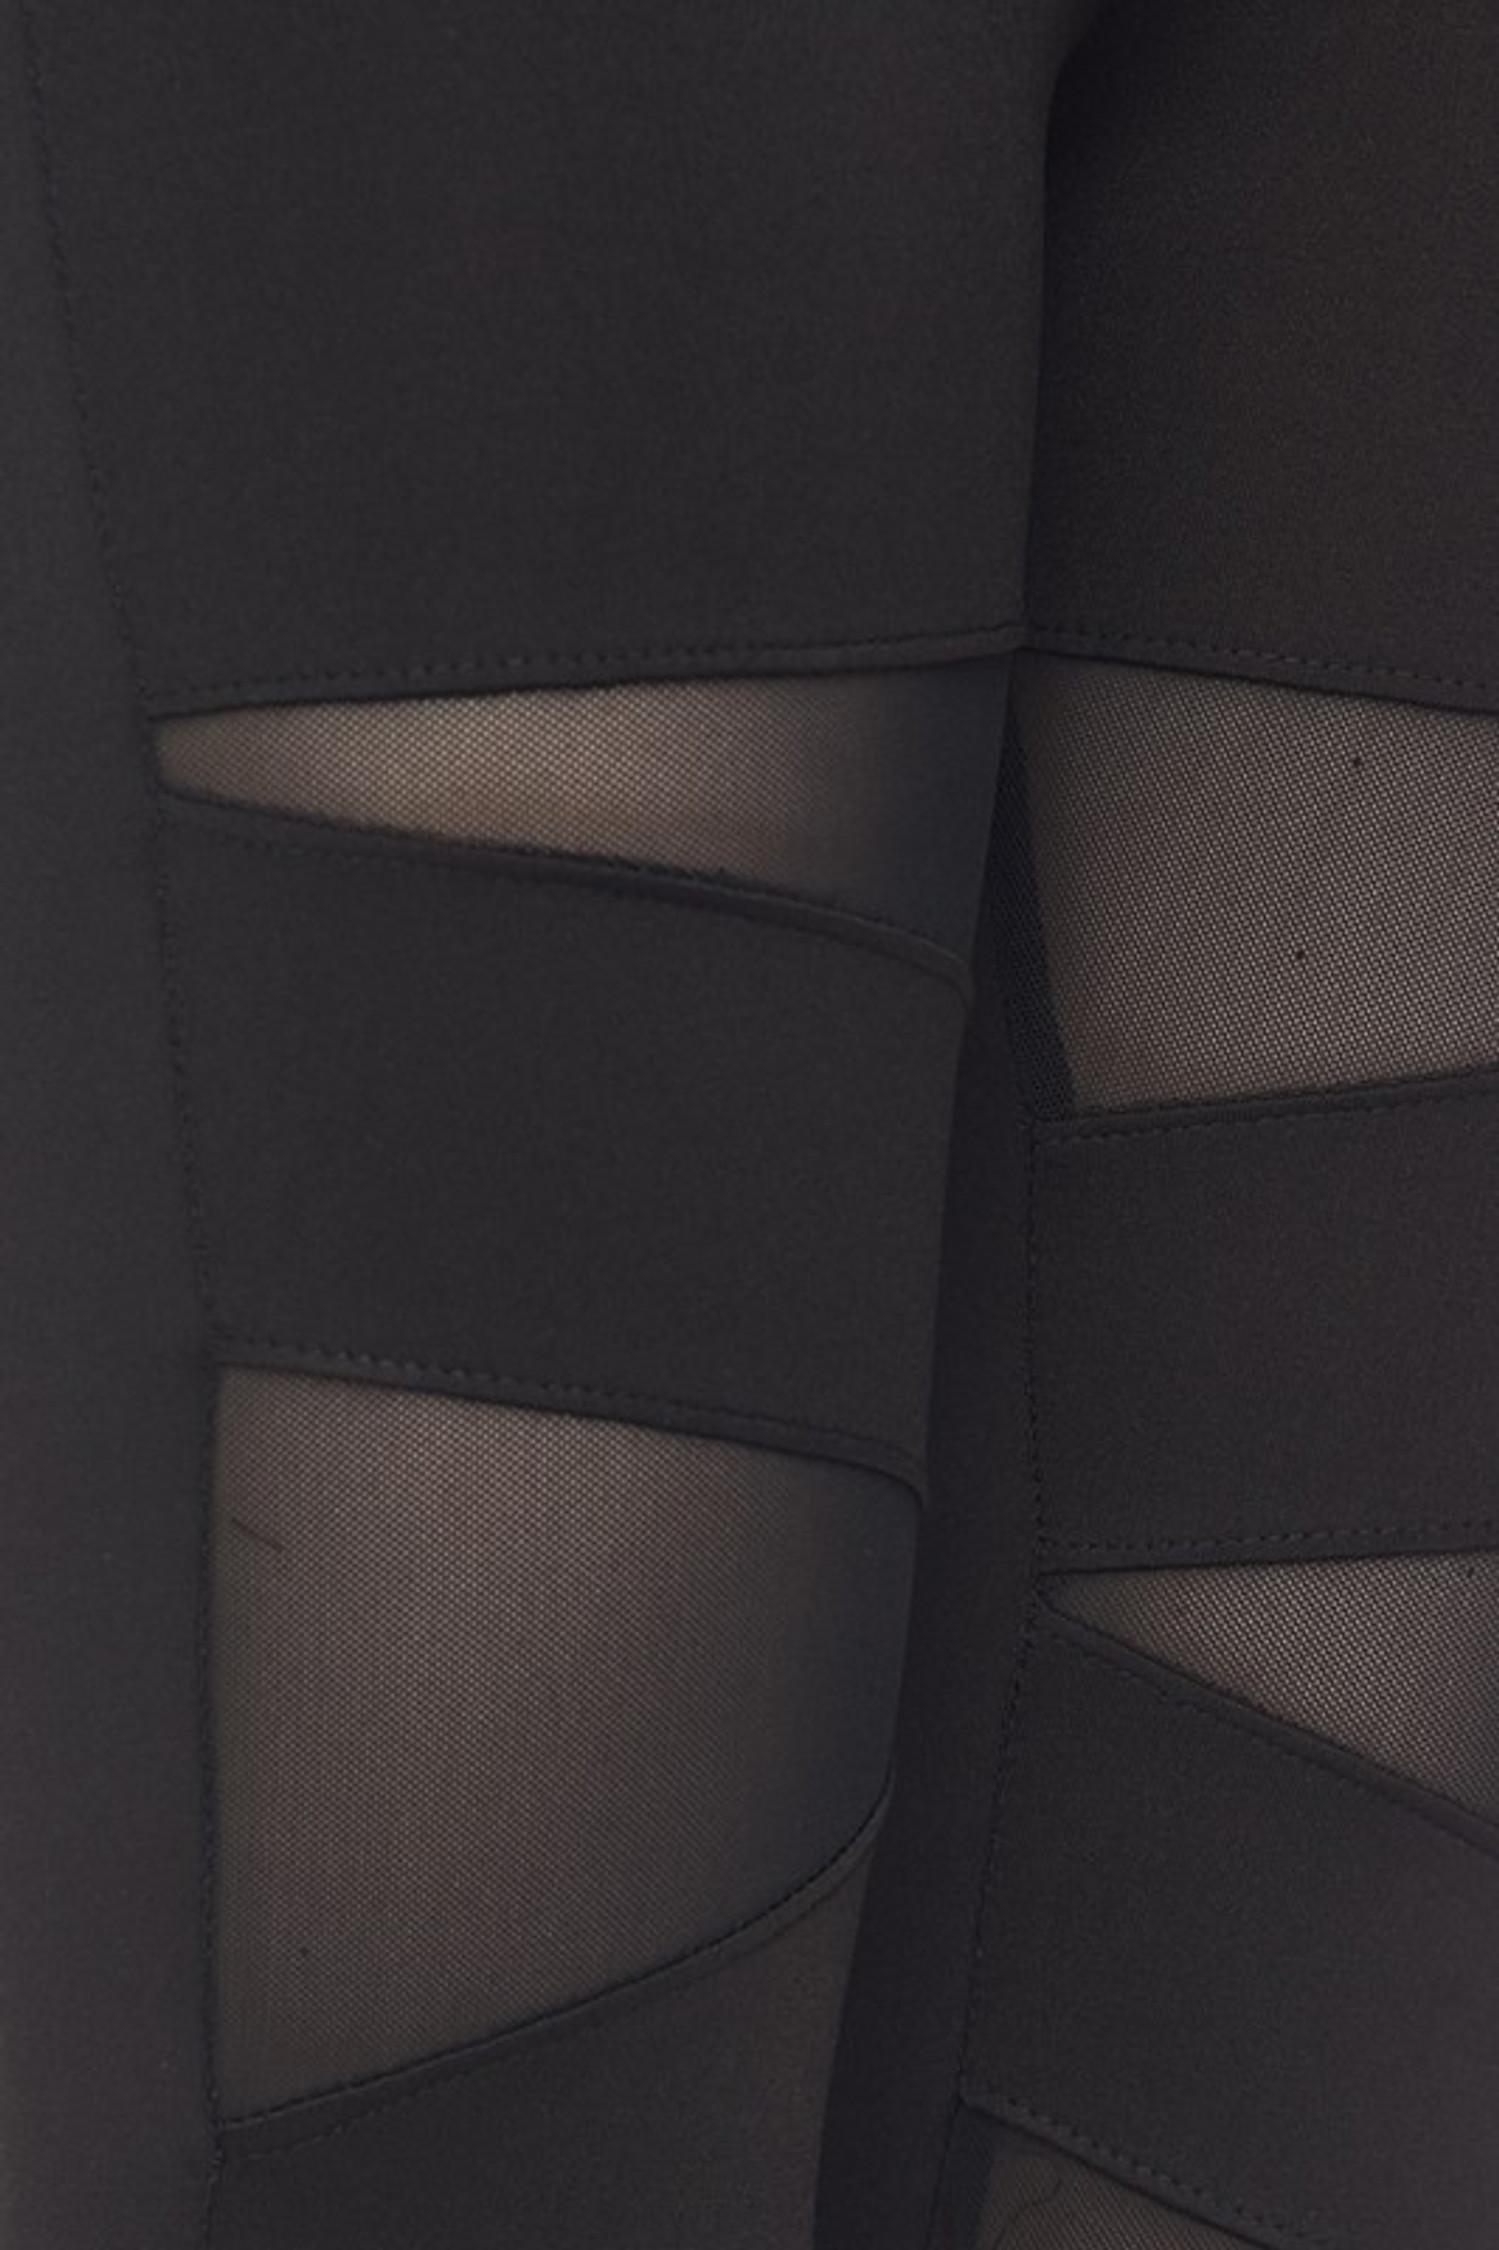 Close-up of mesh panels on Black Triangular Mesh Plus Size Sport Leggings